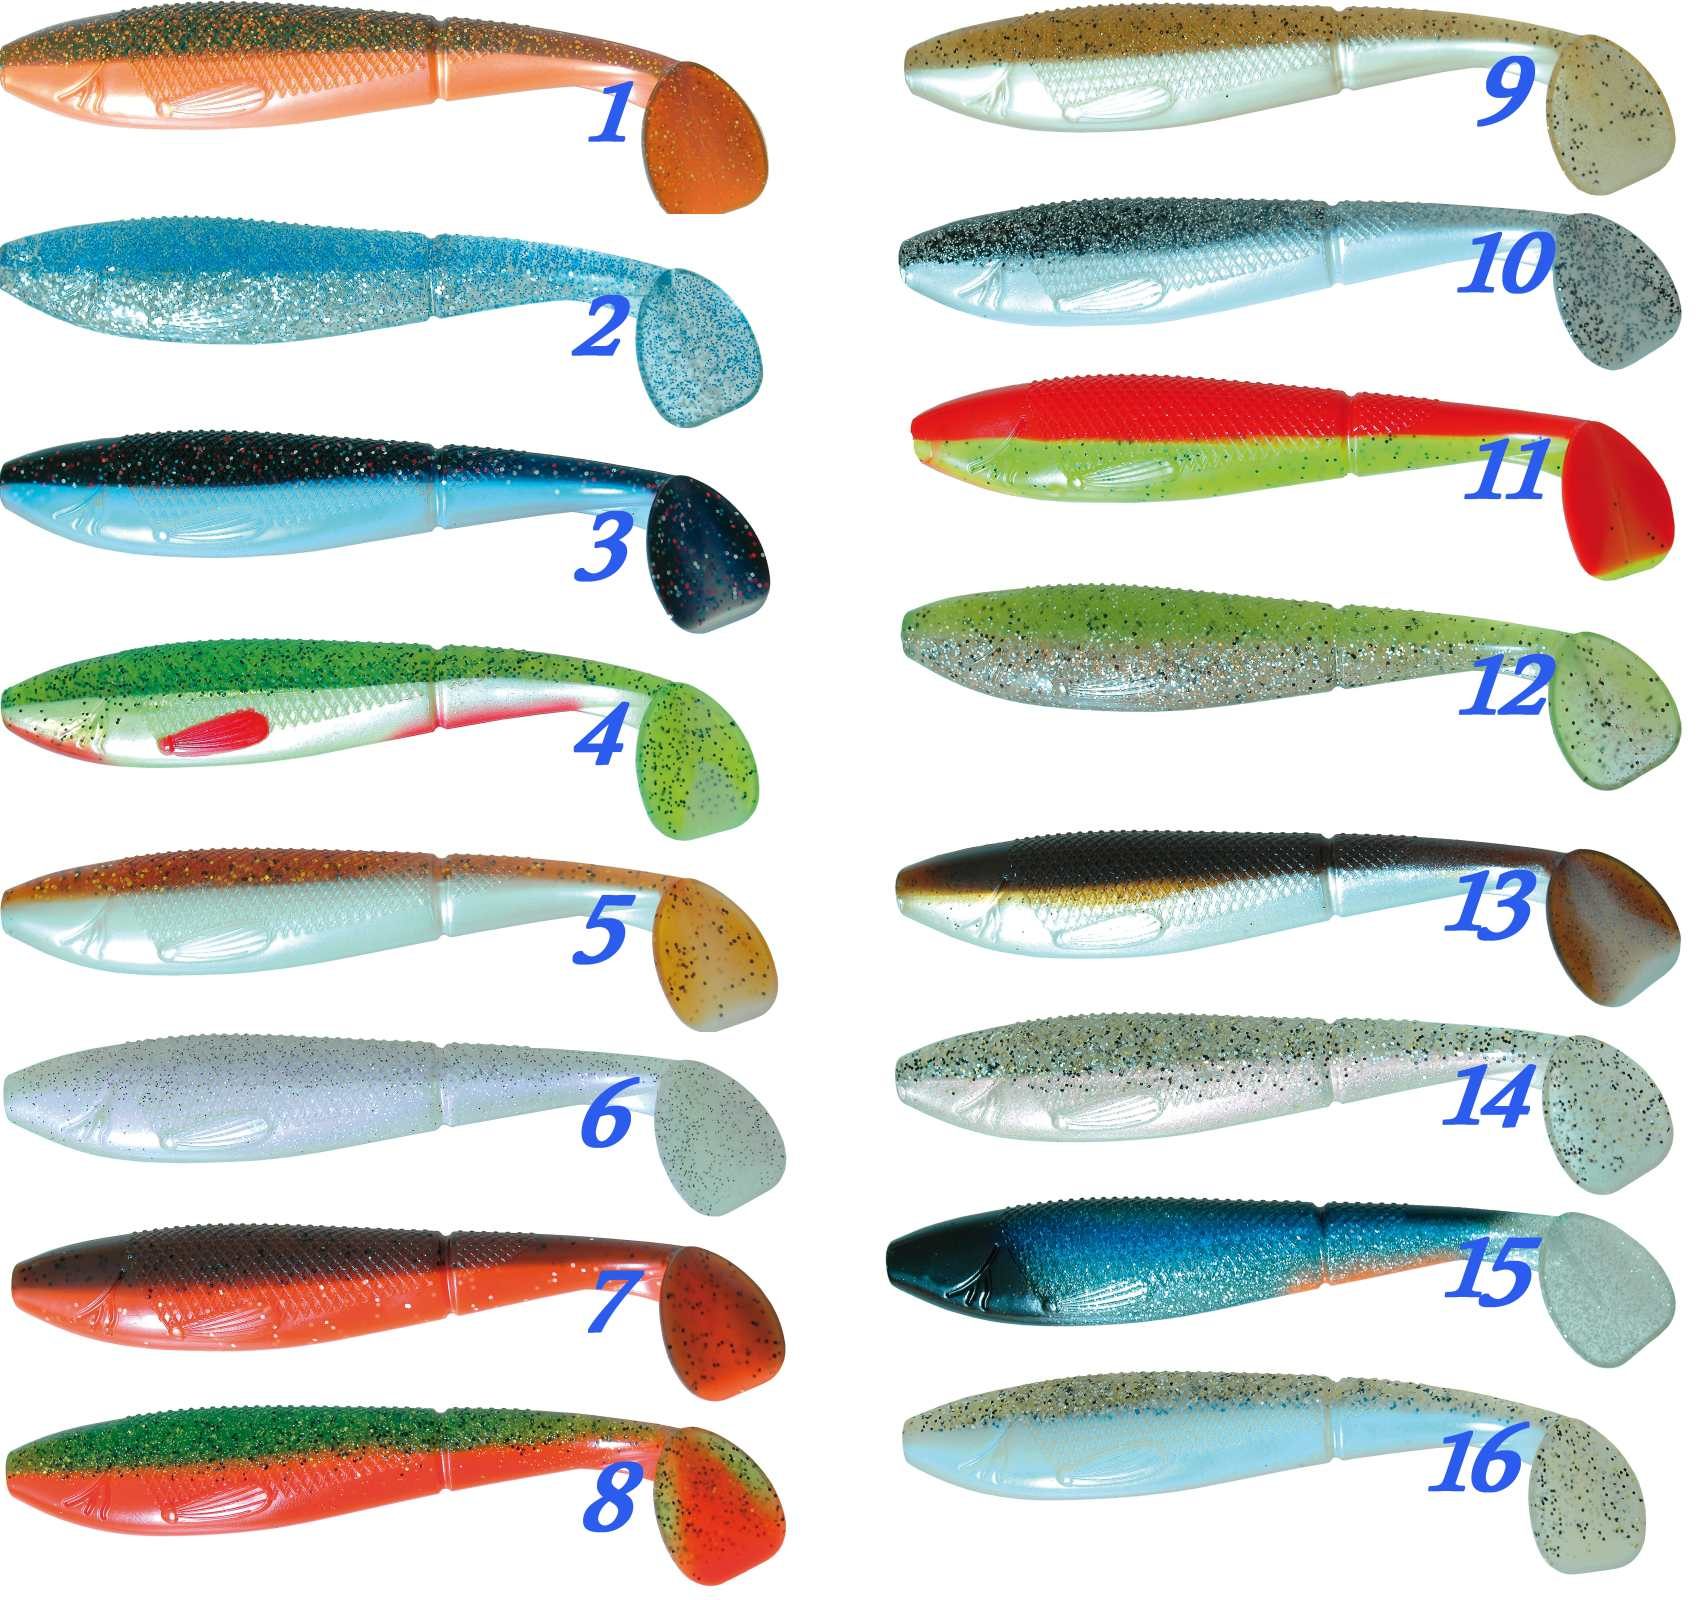 Gumová nástraha Atoka Scaler 20cm / 2ks rybí aroma, riper - zvìtšit obrázek